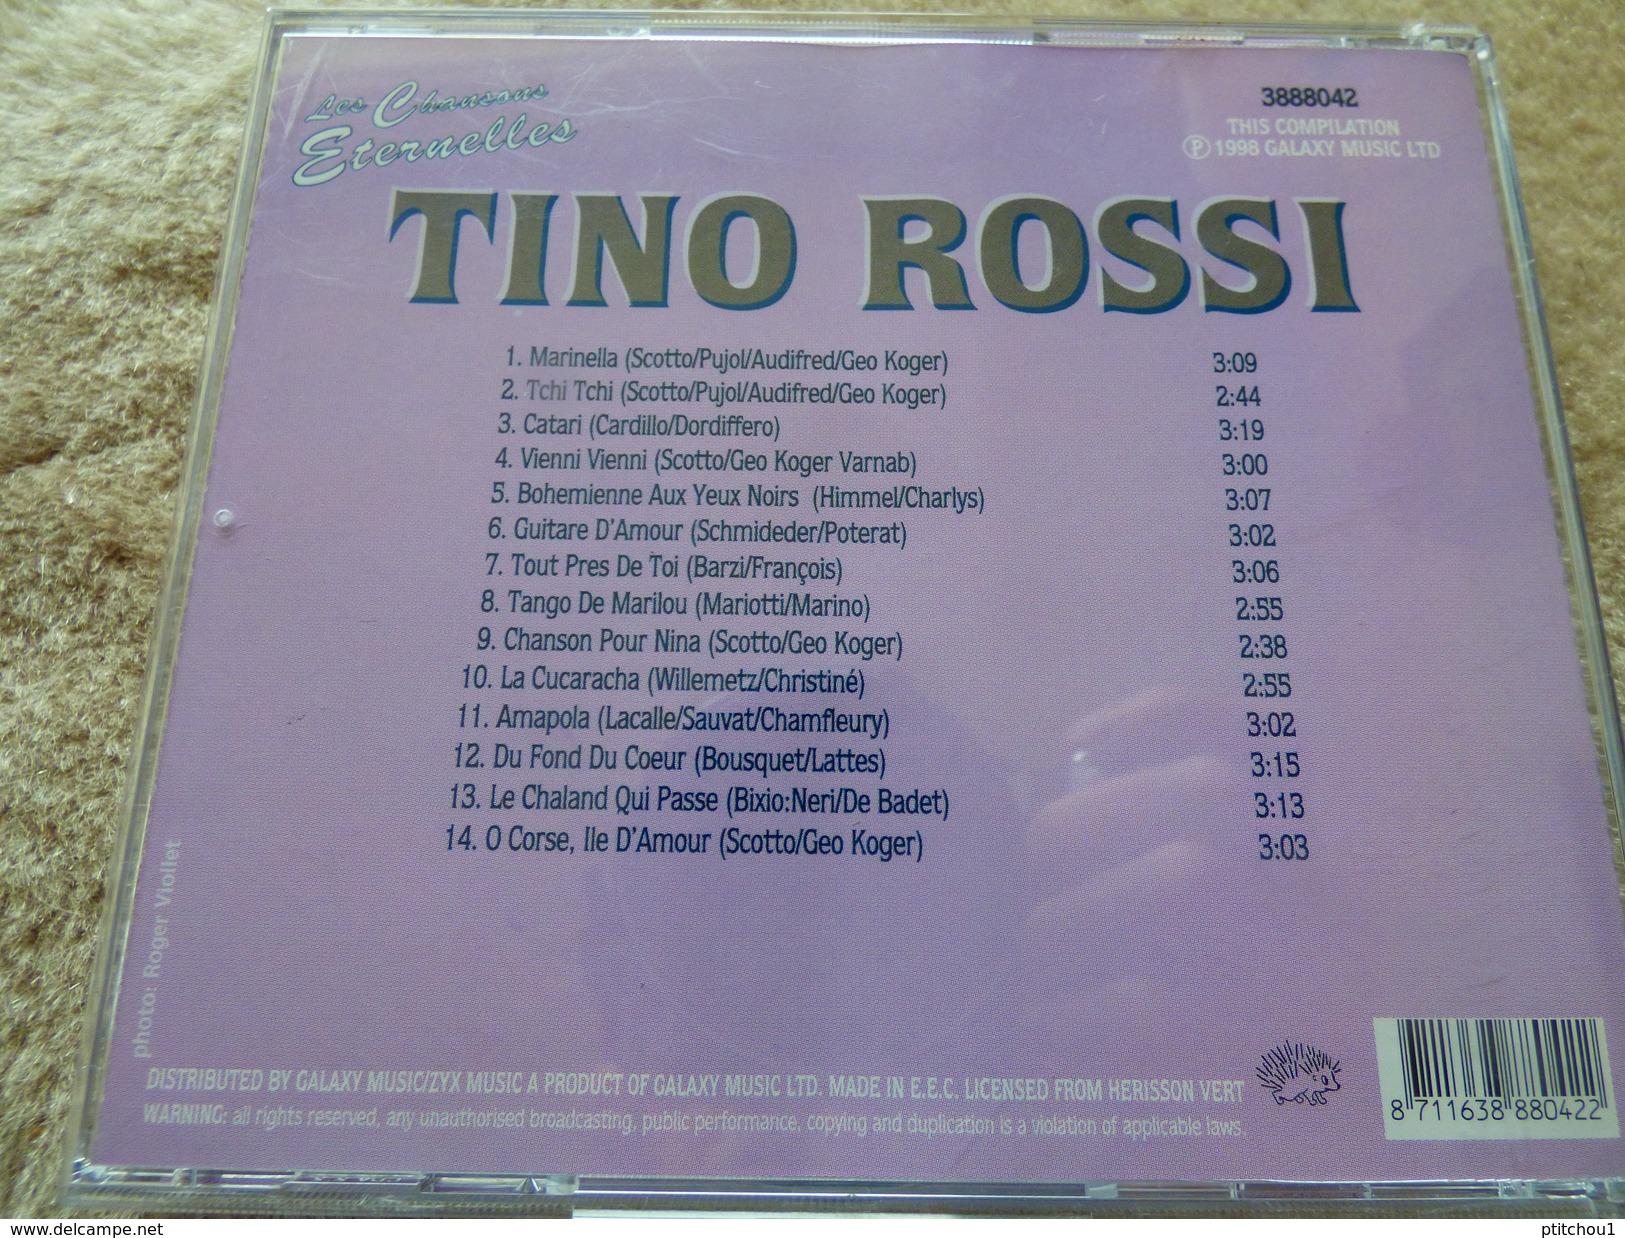 Tino ROSSI - Sonstige